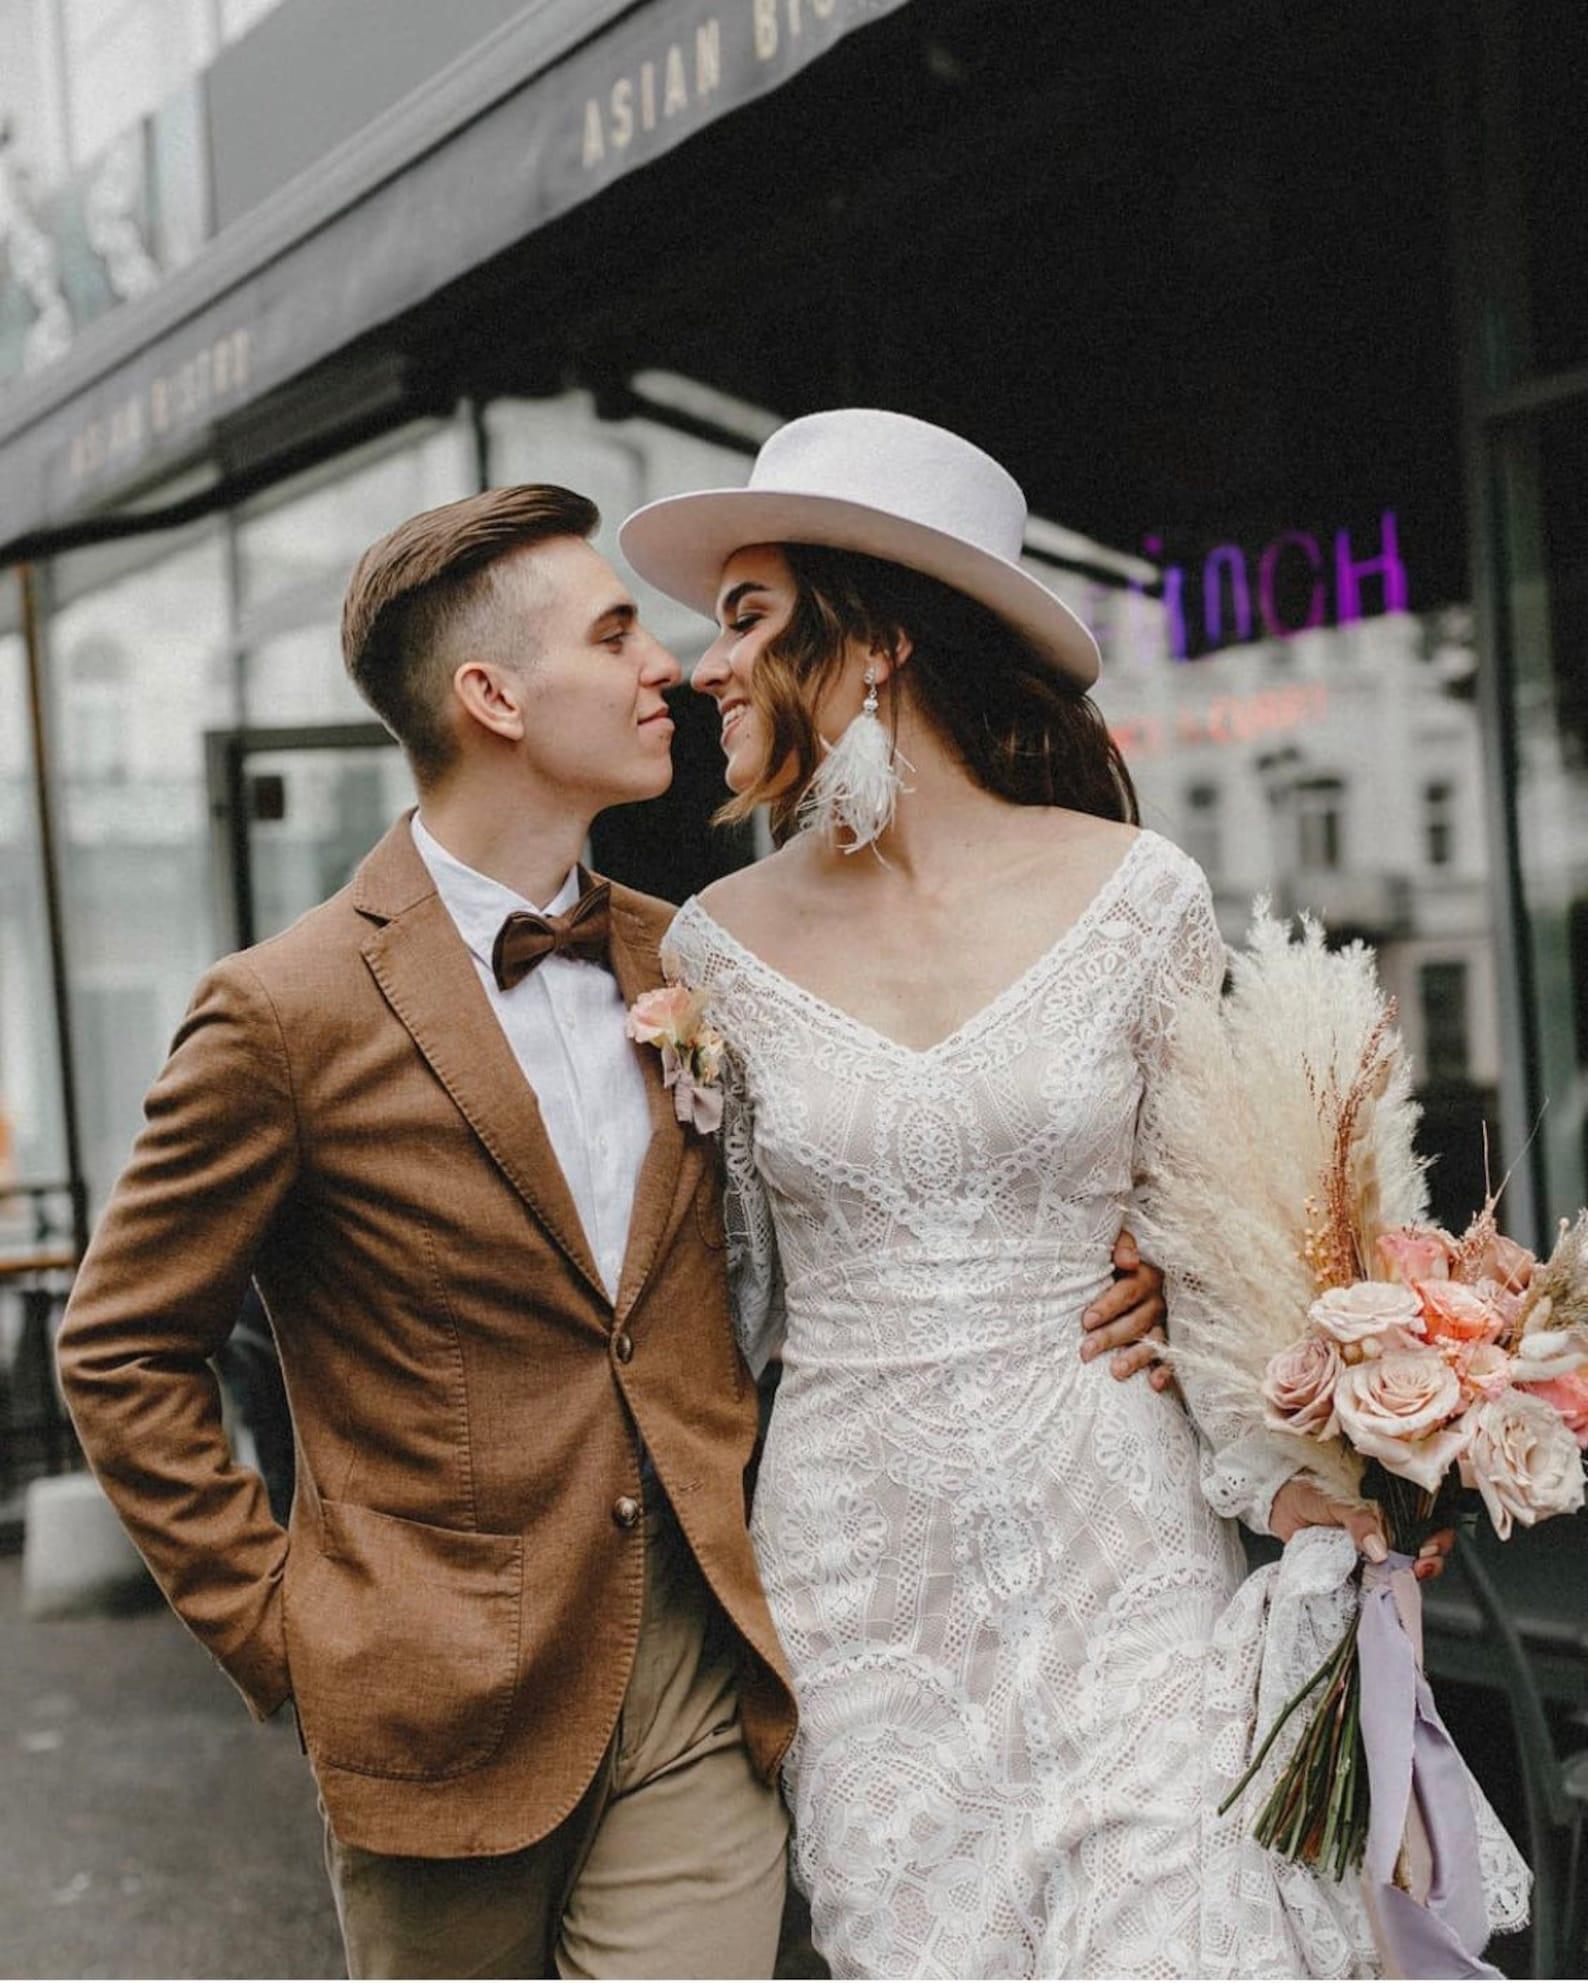 Long-sleeved lace wedding dress